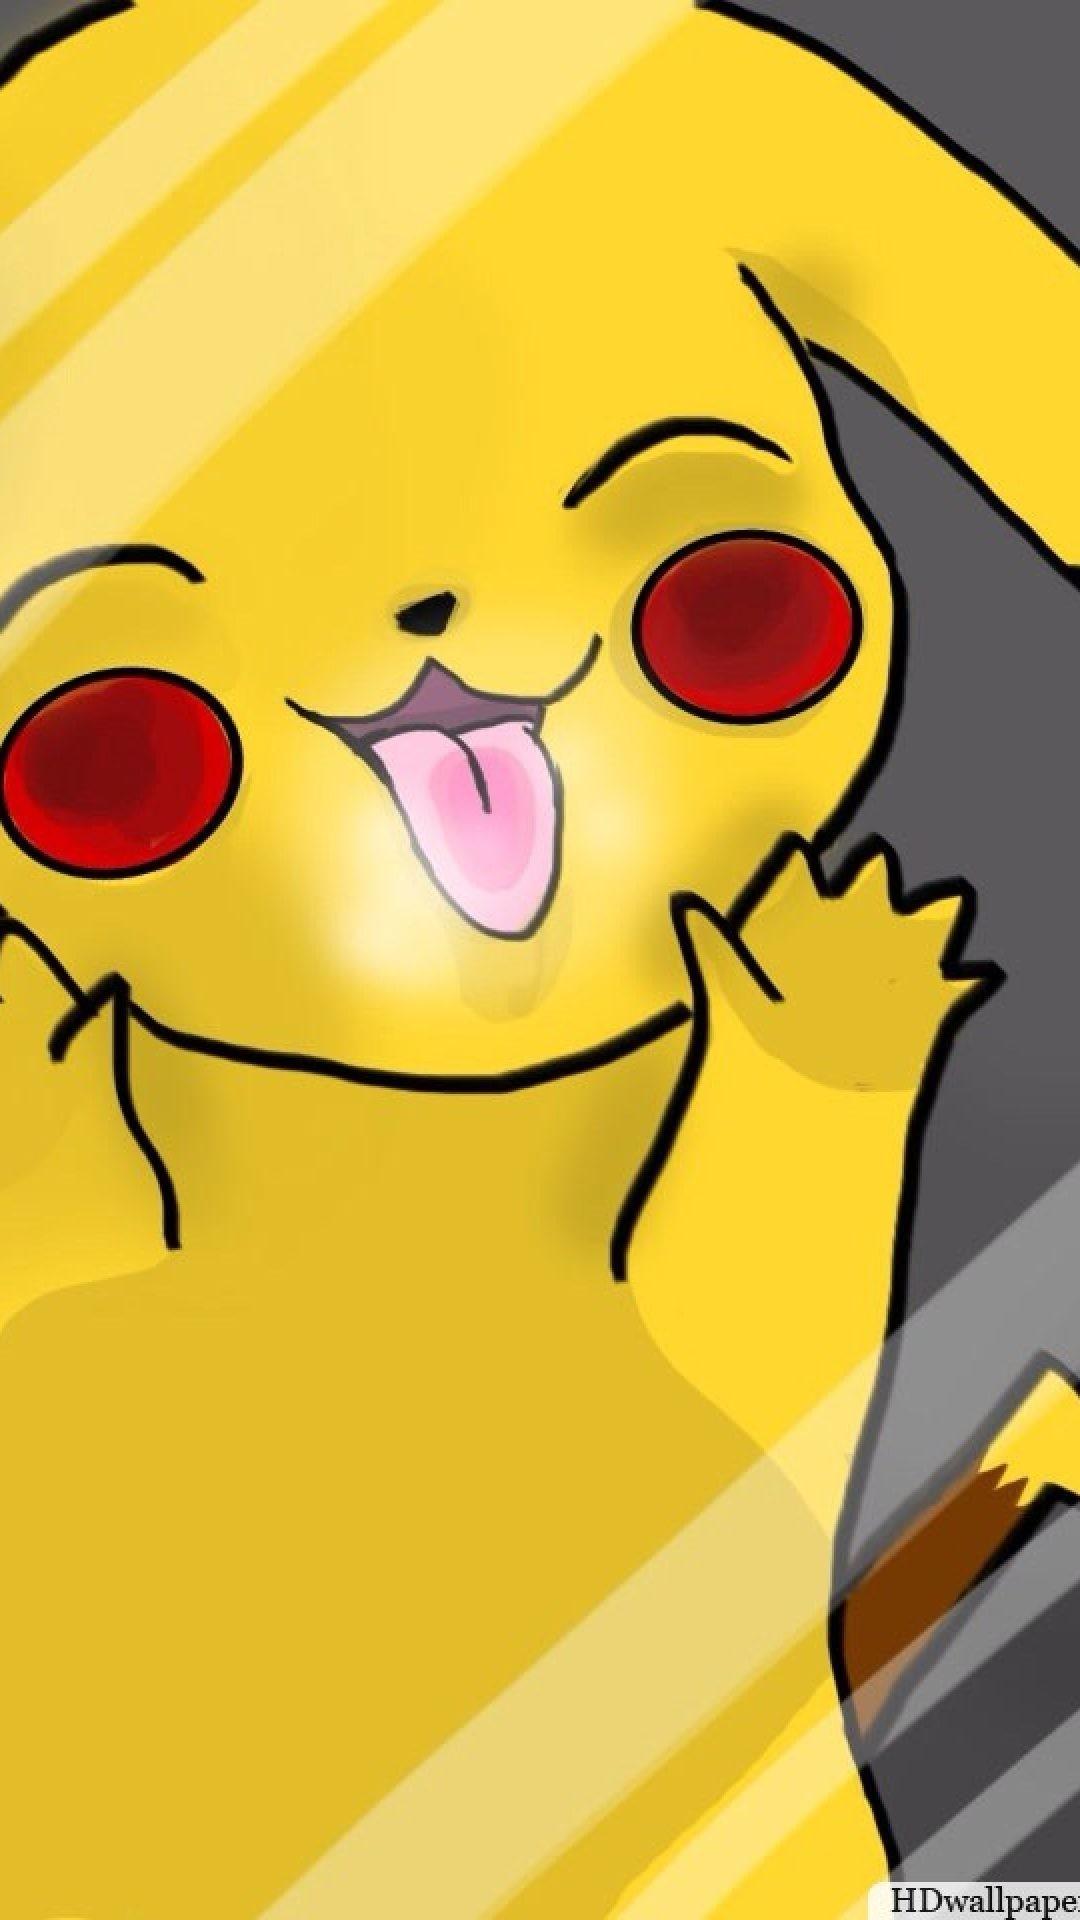 Minion 3d Live Wallpaper Pikachu Hd Wallpaper 81 Images